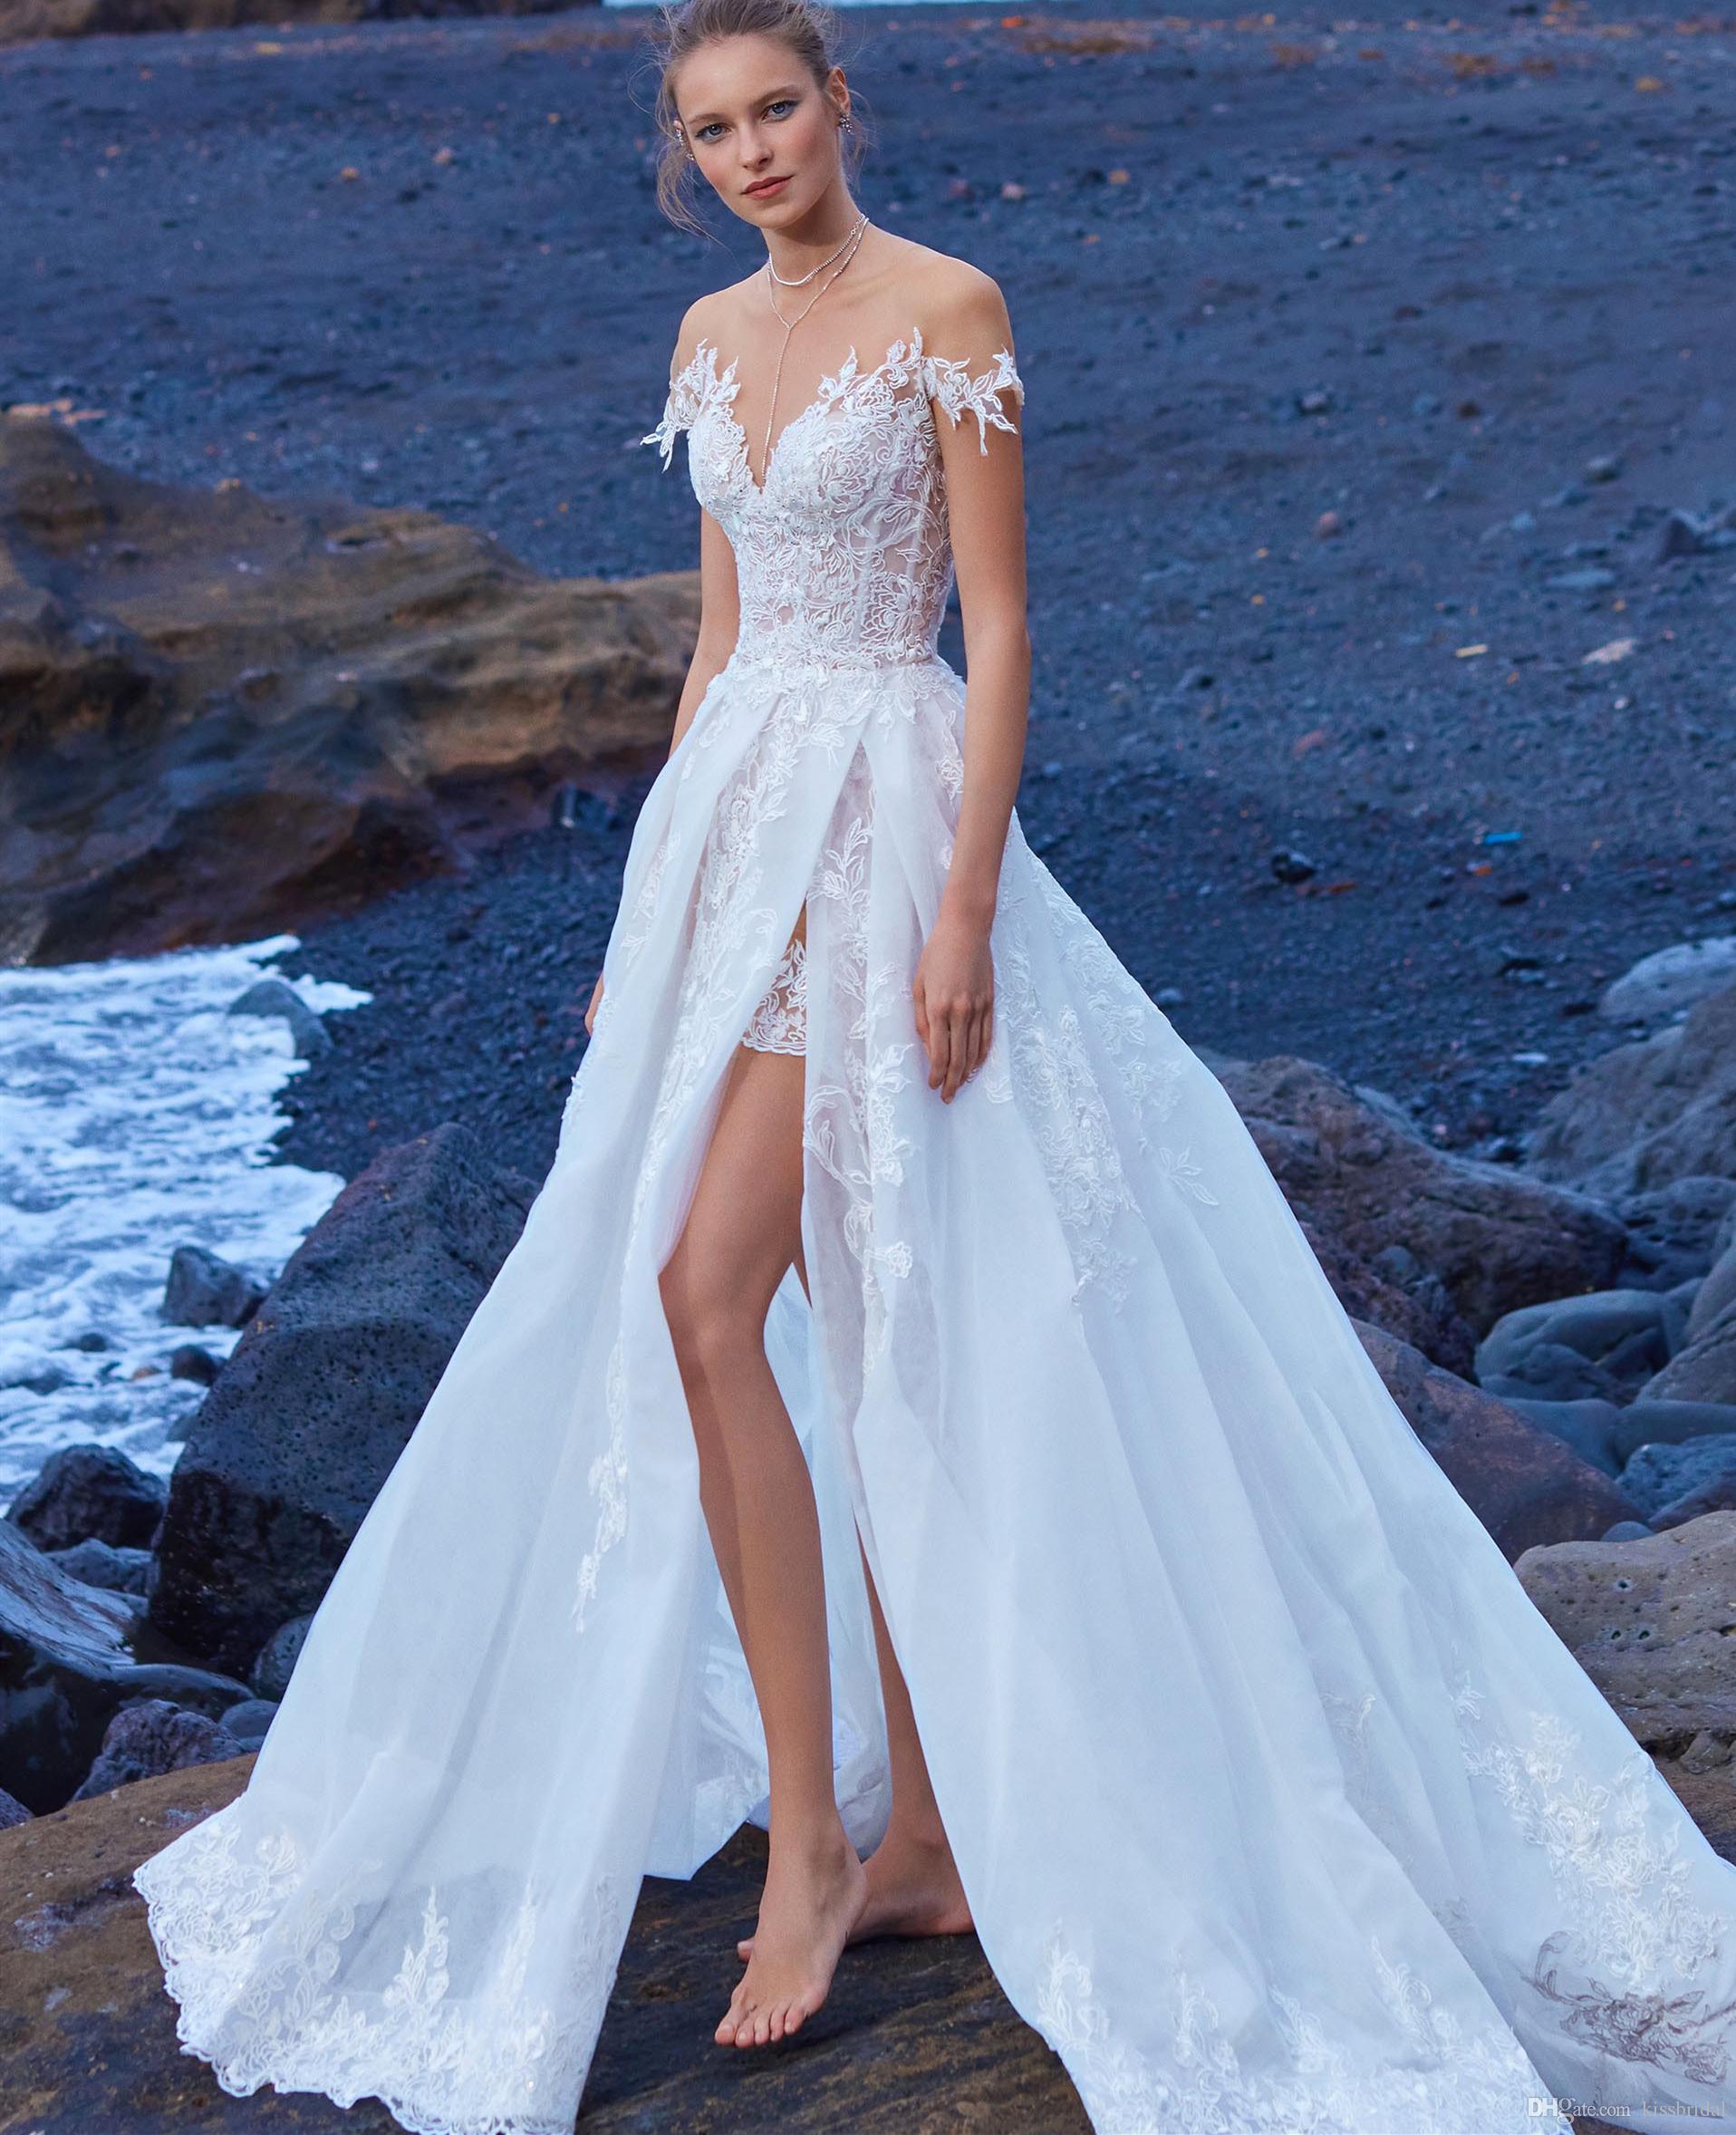 4fd4984b565 Discount Lace Wedding Dresses Short Sleeve 2019 Jewel Neckline Sheer Illusion  Bodice Beach Wedding Dress Bridal Gowns Vestido De Novia Wedding Dress ...